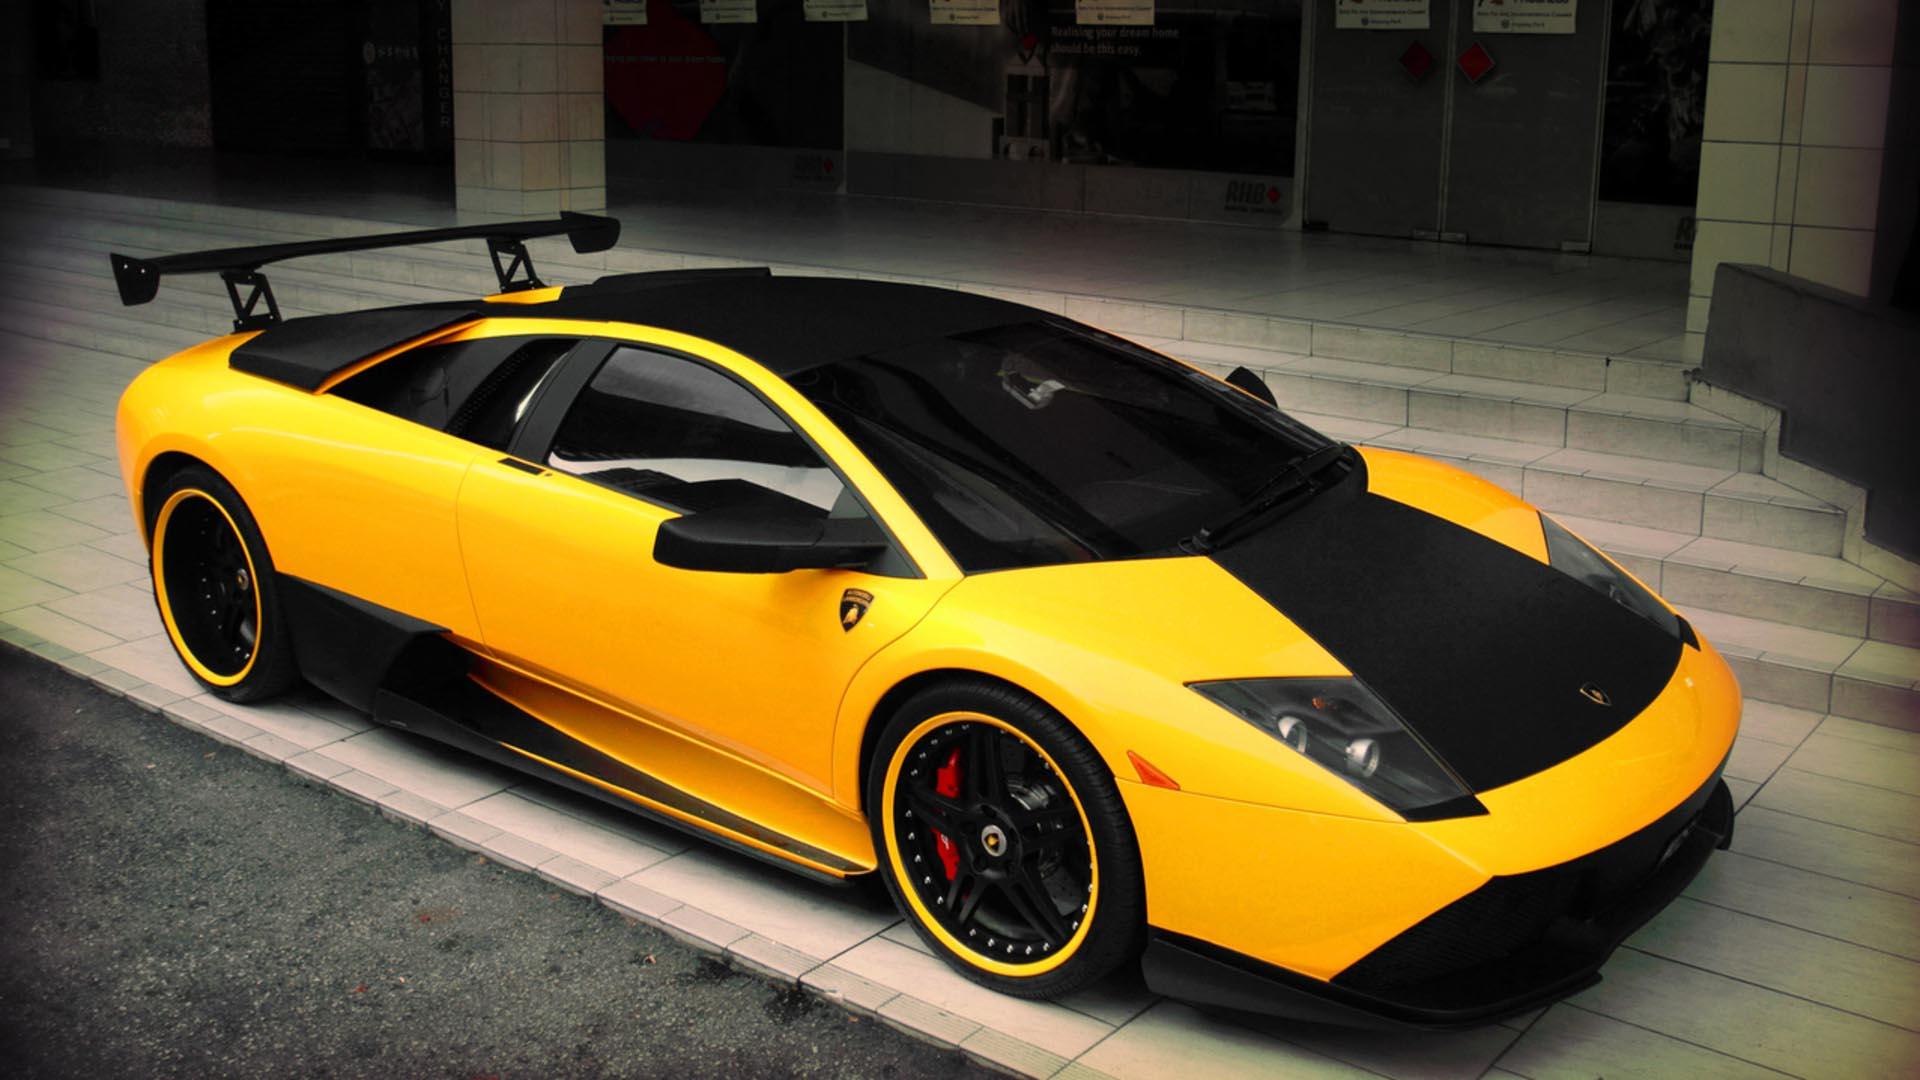 Cool Yellow Lamborghini Wallpaper X Px - Cool yellow cars